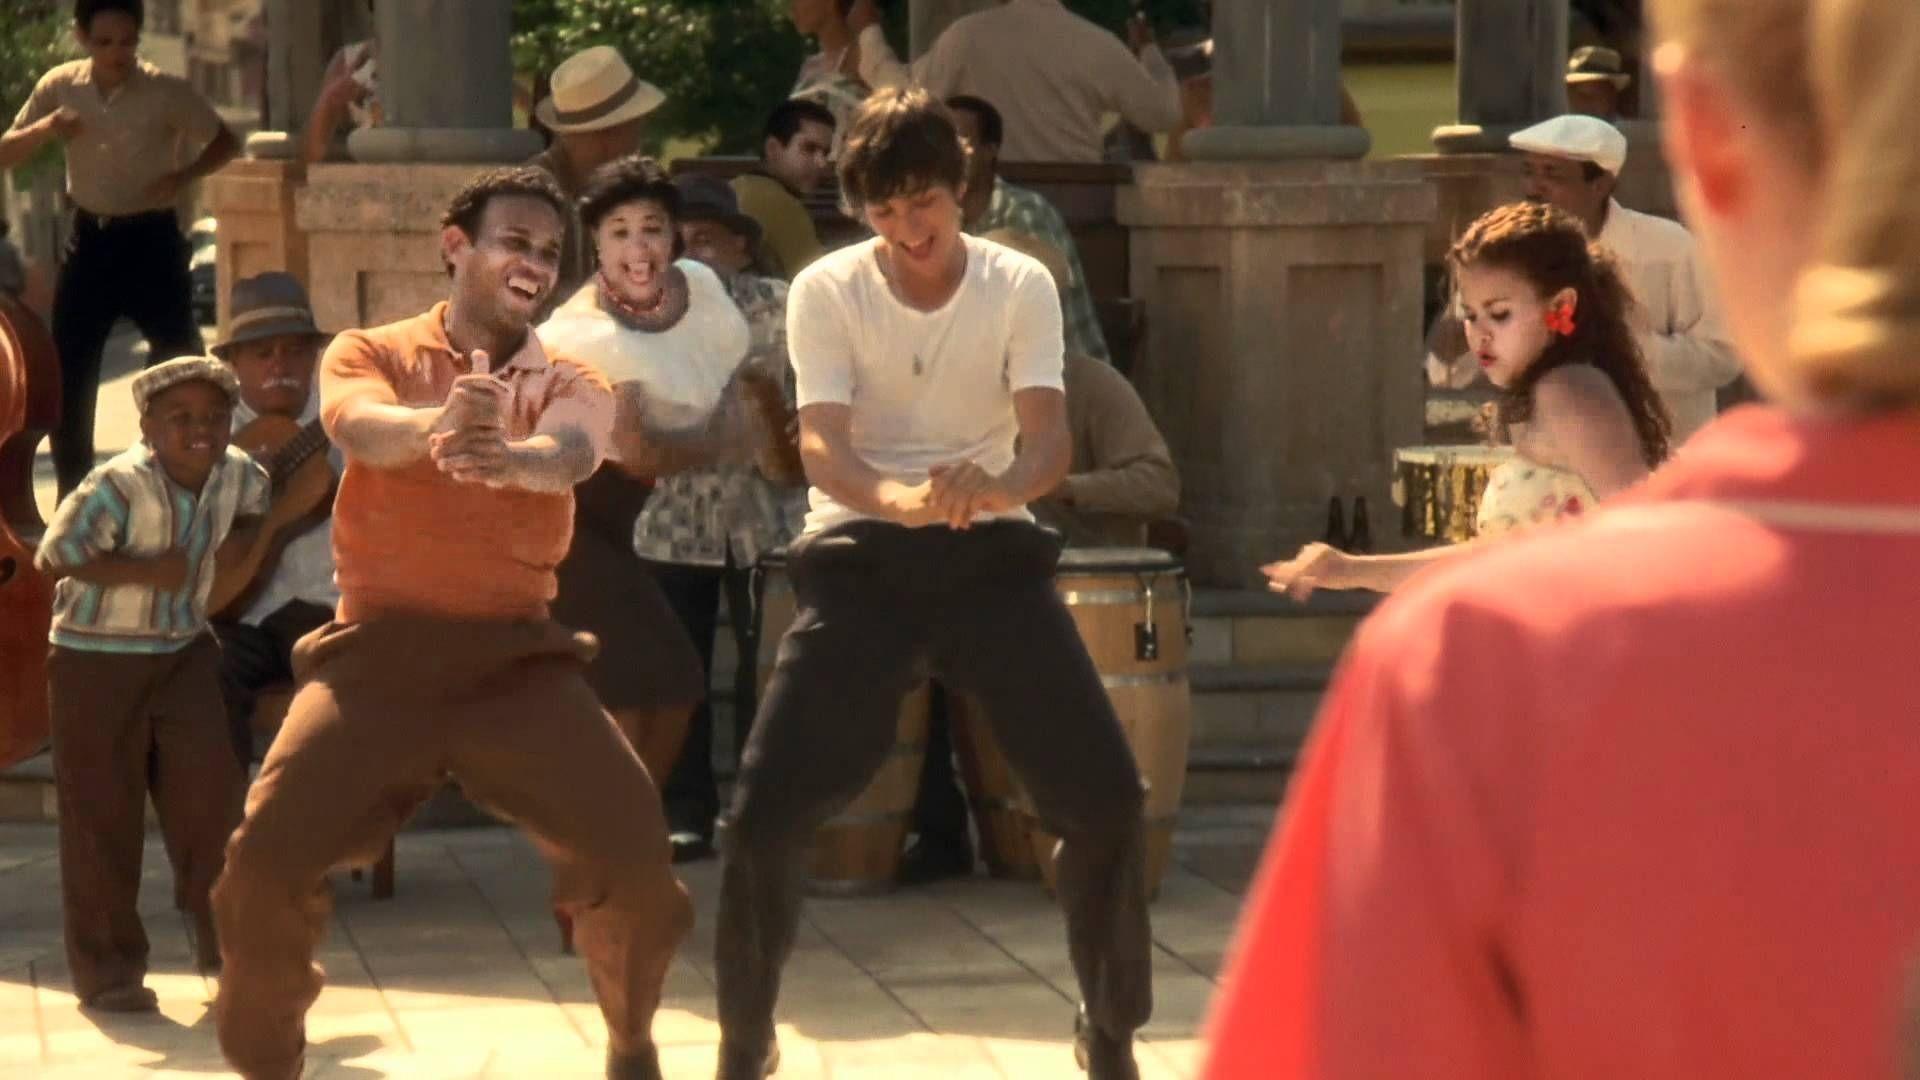 Res: 1920x1080, Dirty Dancing: Havana Nights - Trailer...Diego Luna! ;) (in white t-shirt)